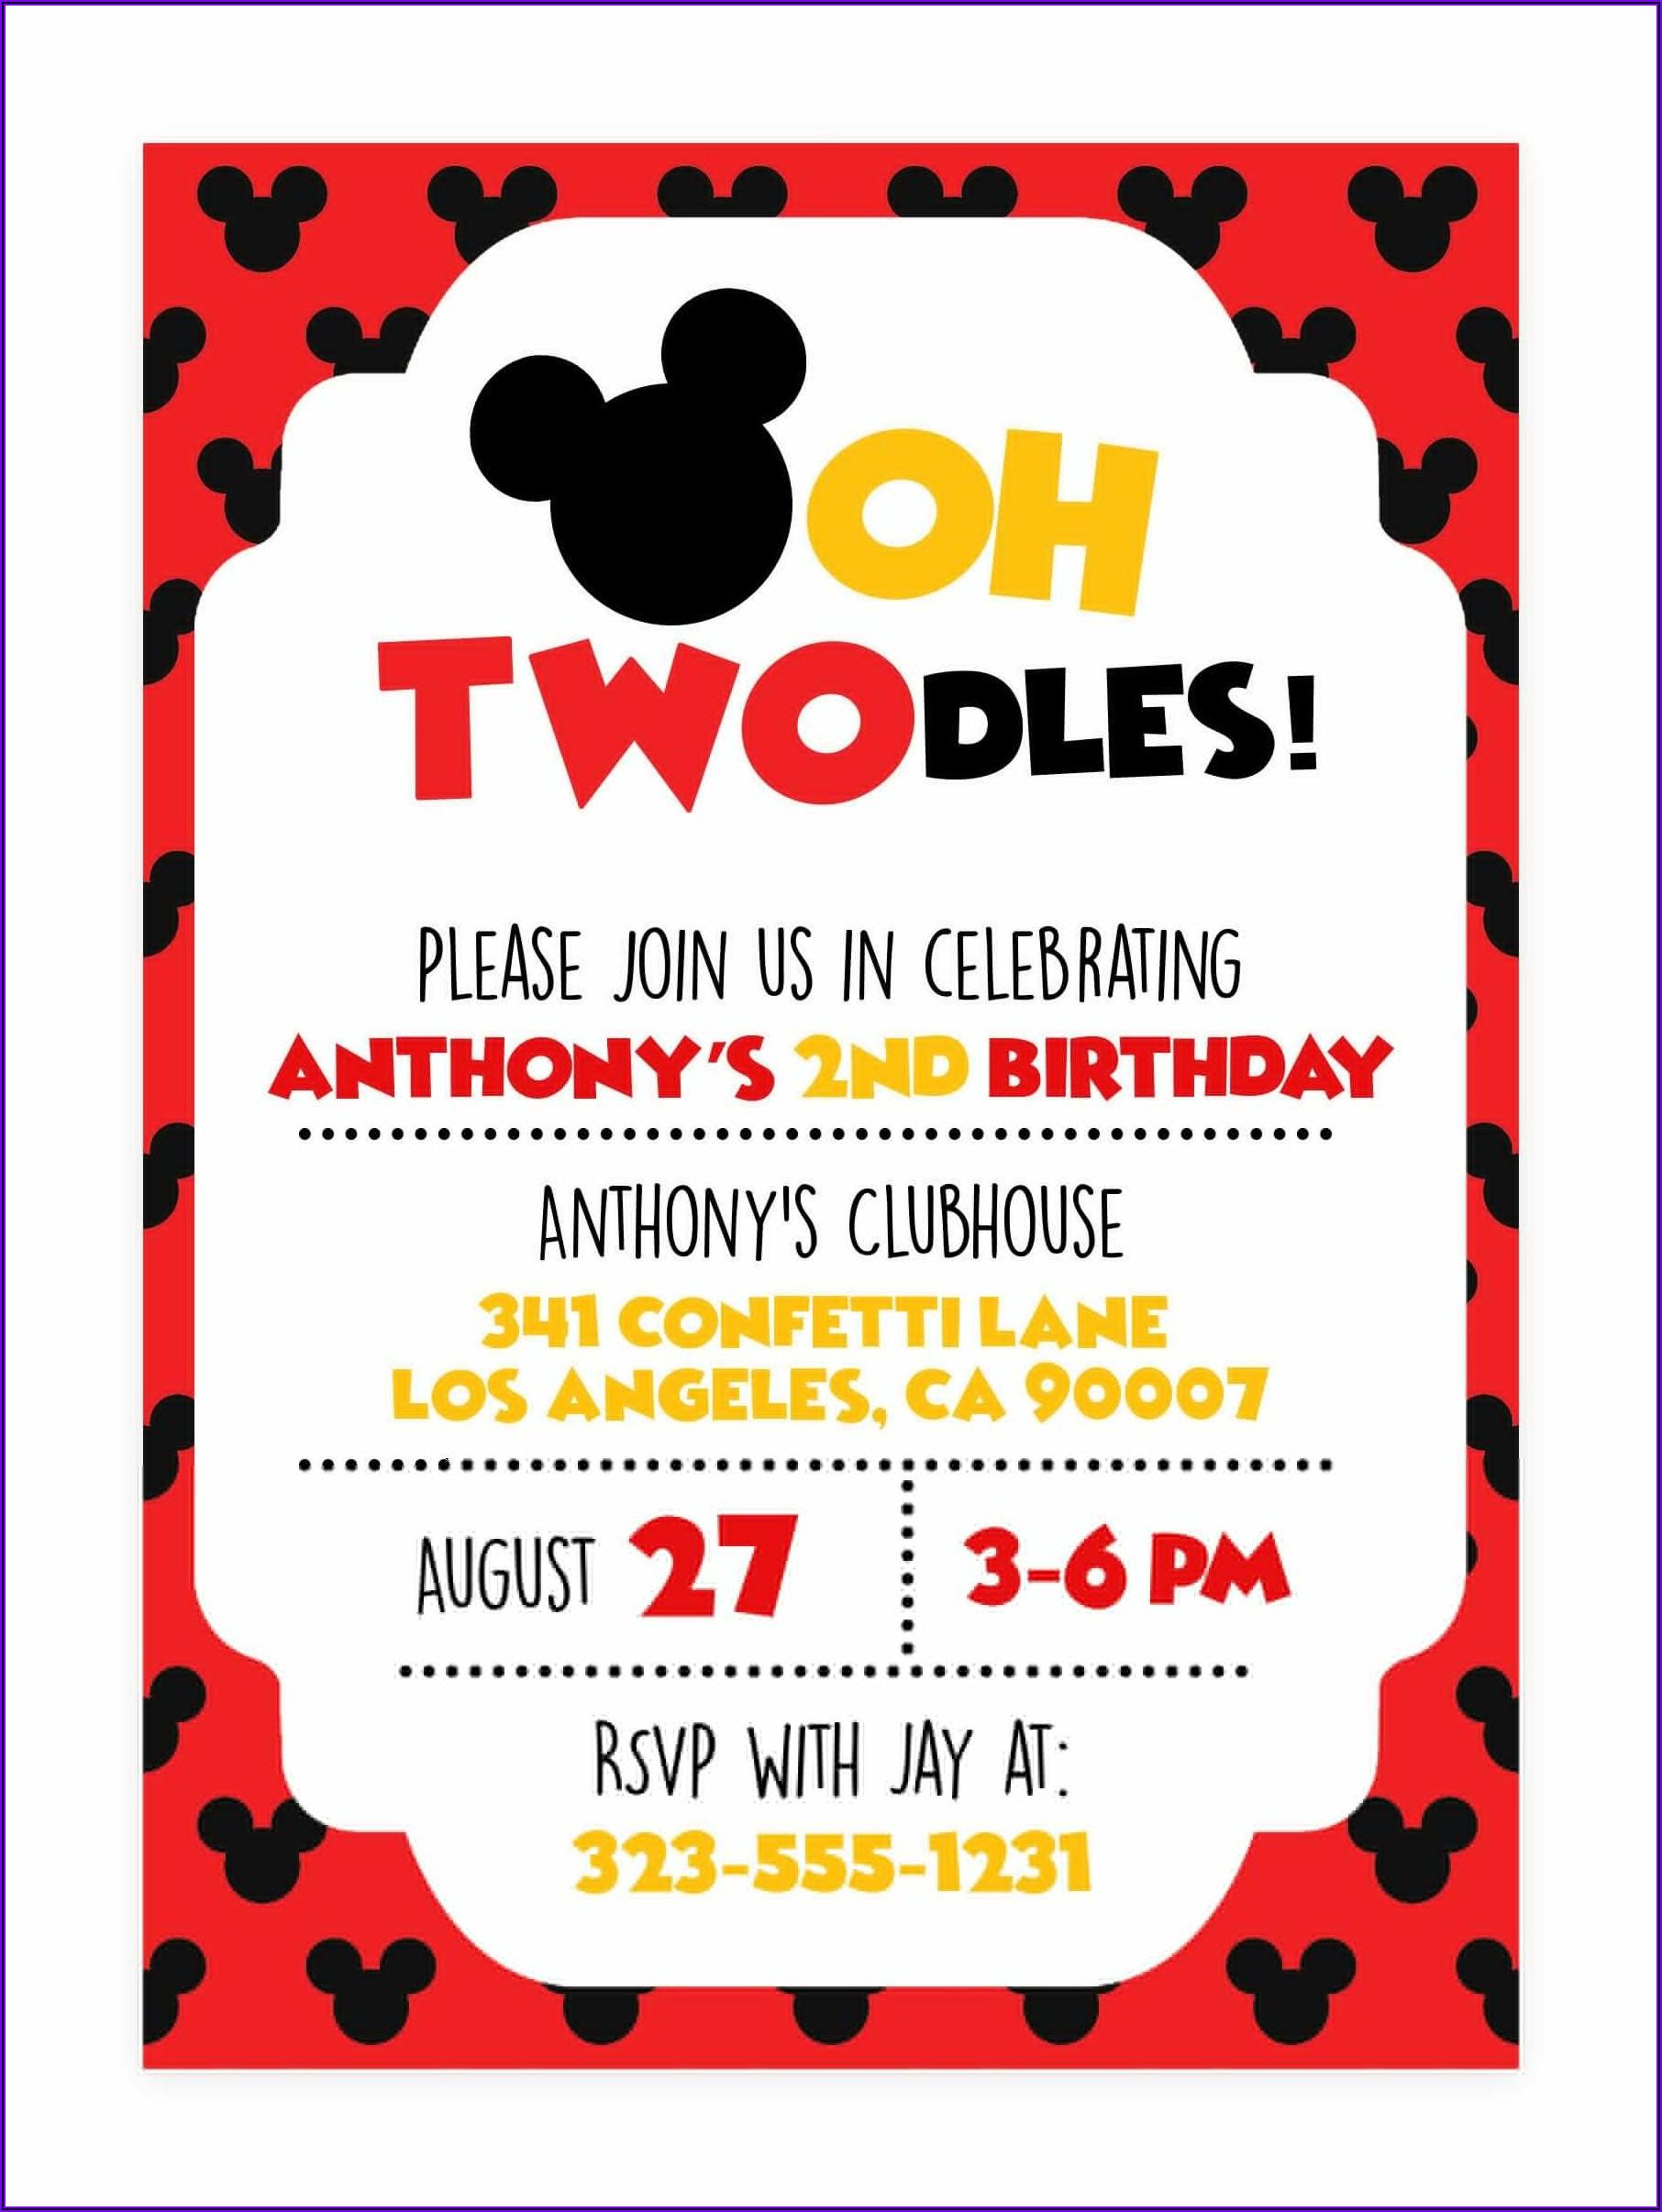 Oh Twodles Birthday Invitations Free